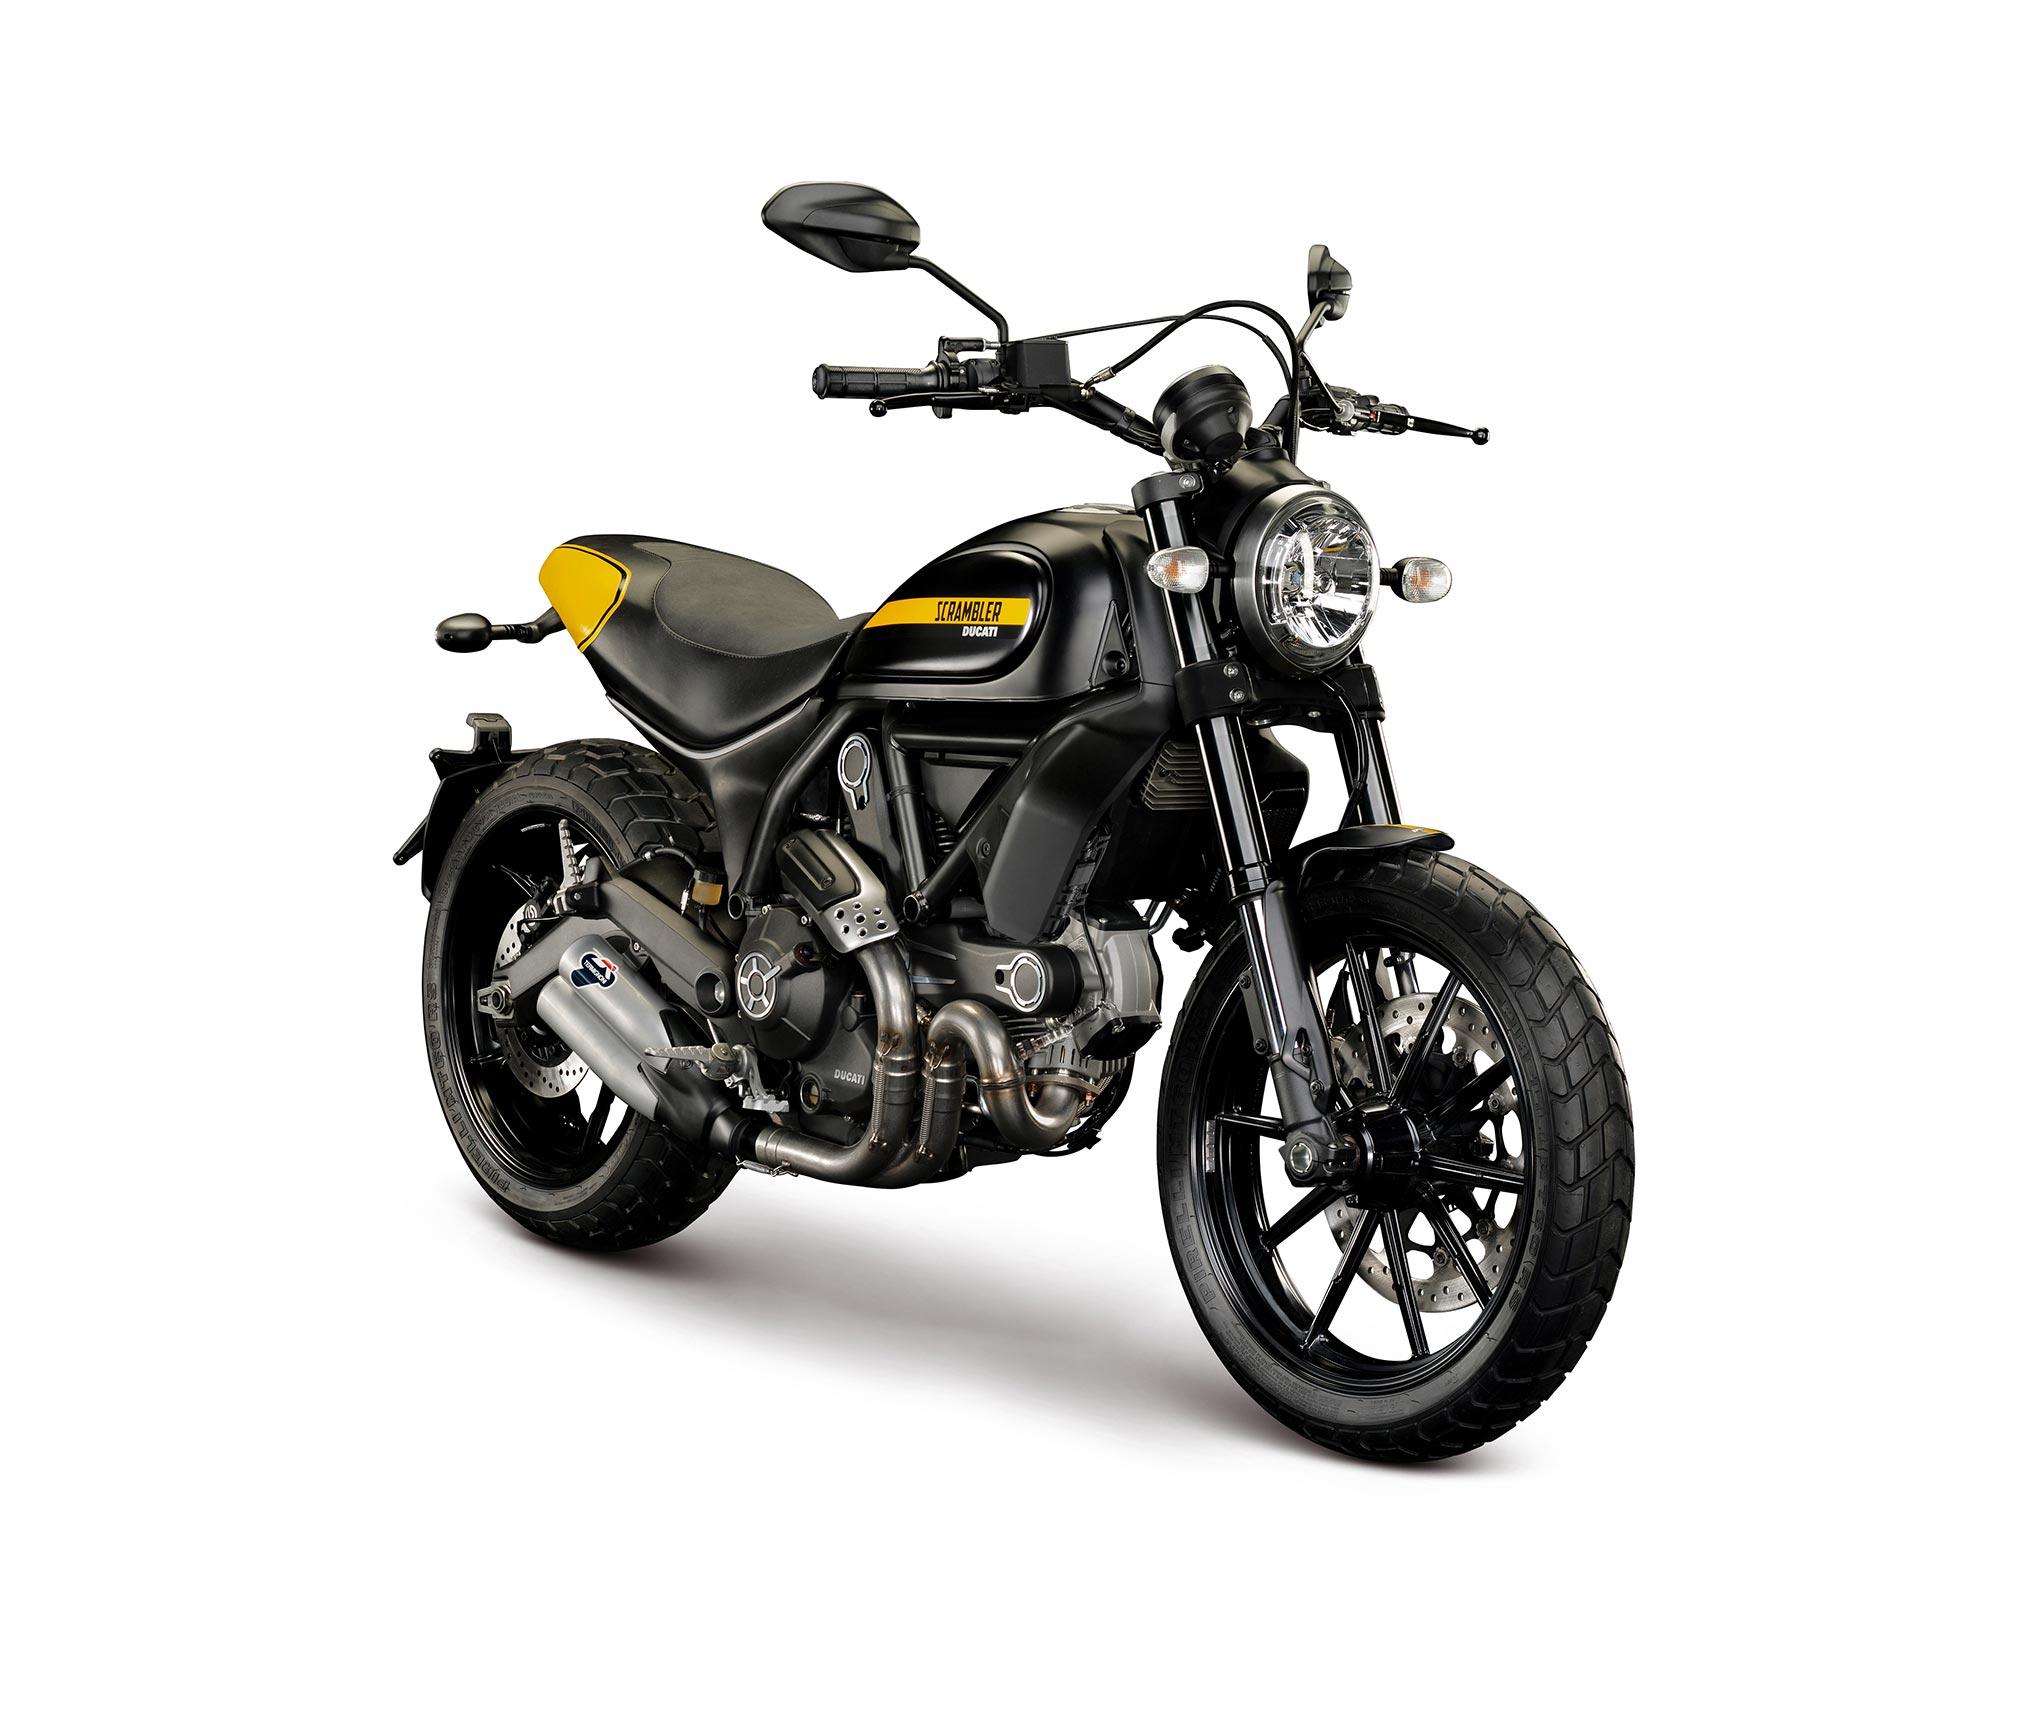 Ducati Scrambler Full Throttle Review